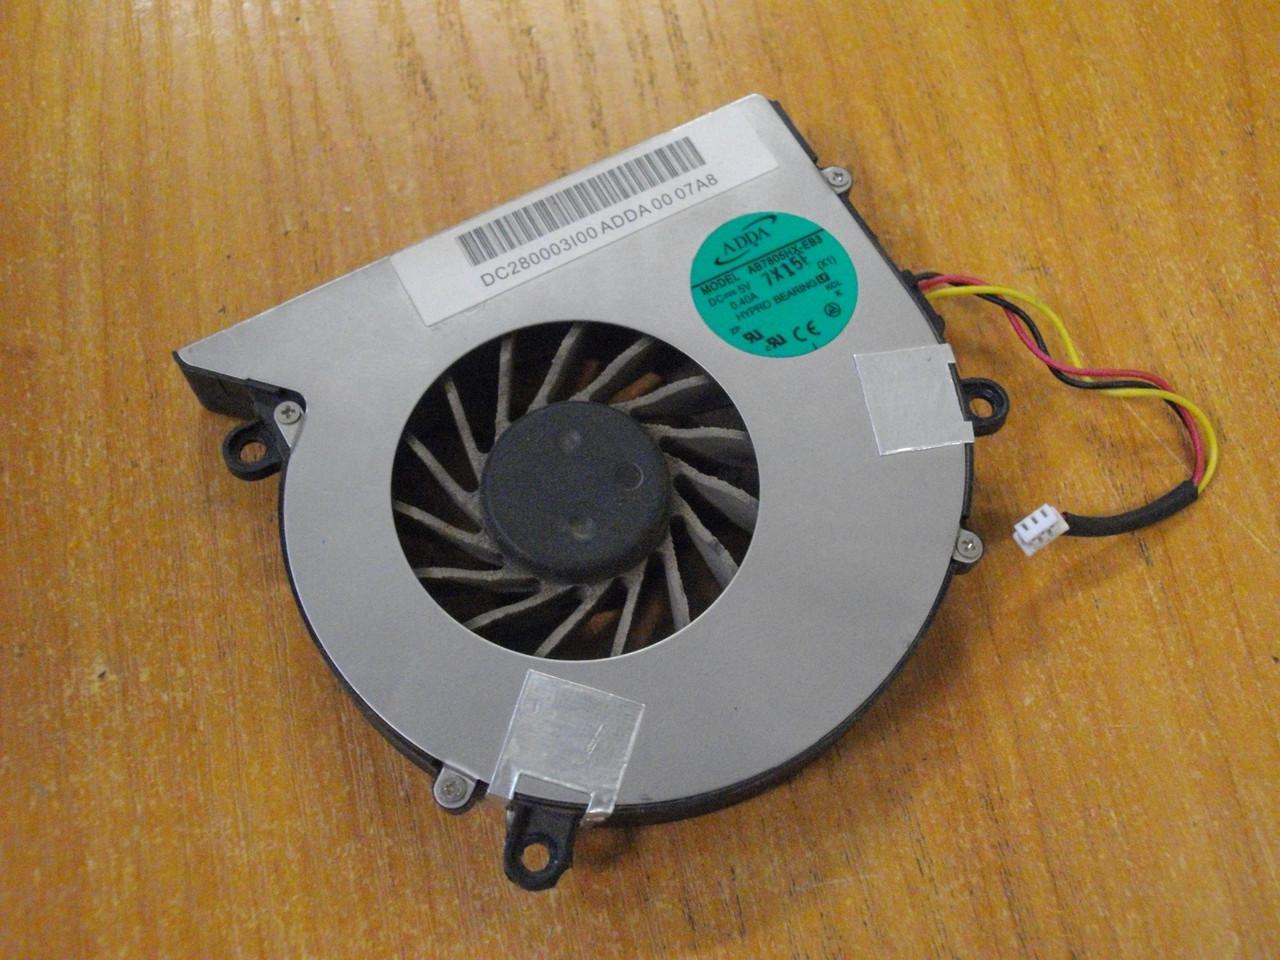 Вентилятор AB7805HX-EB3 Acer Aspire 5520, 5520G